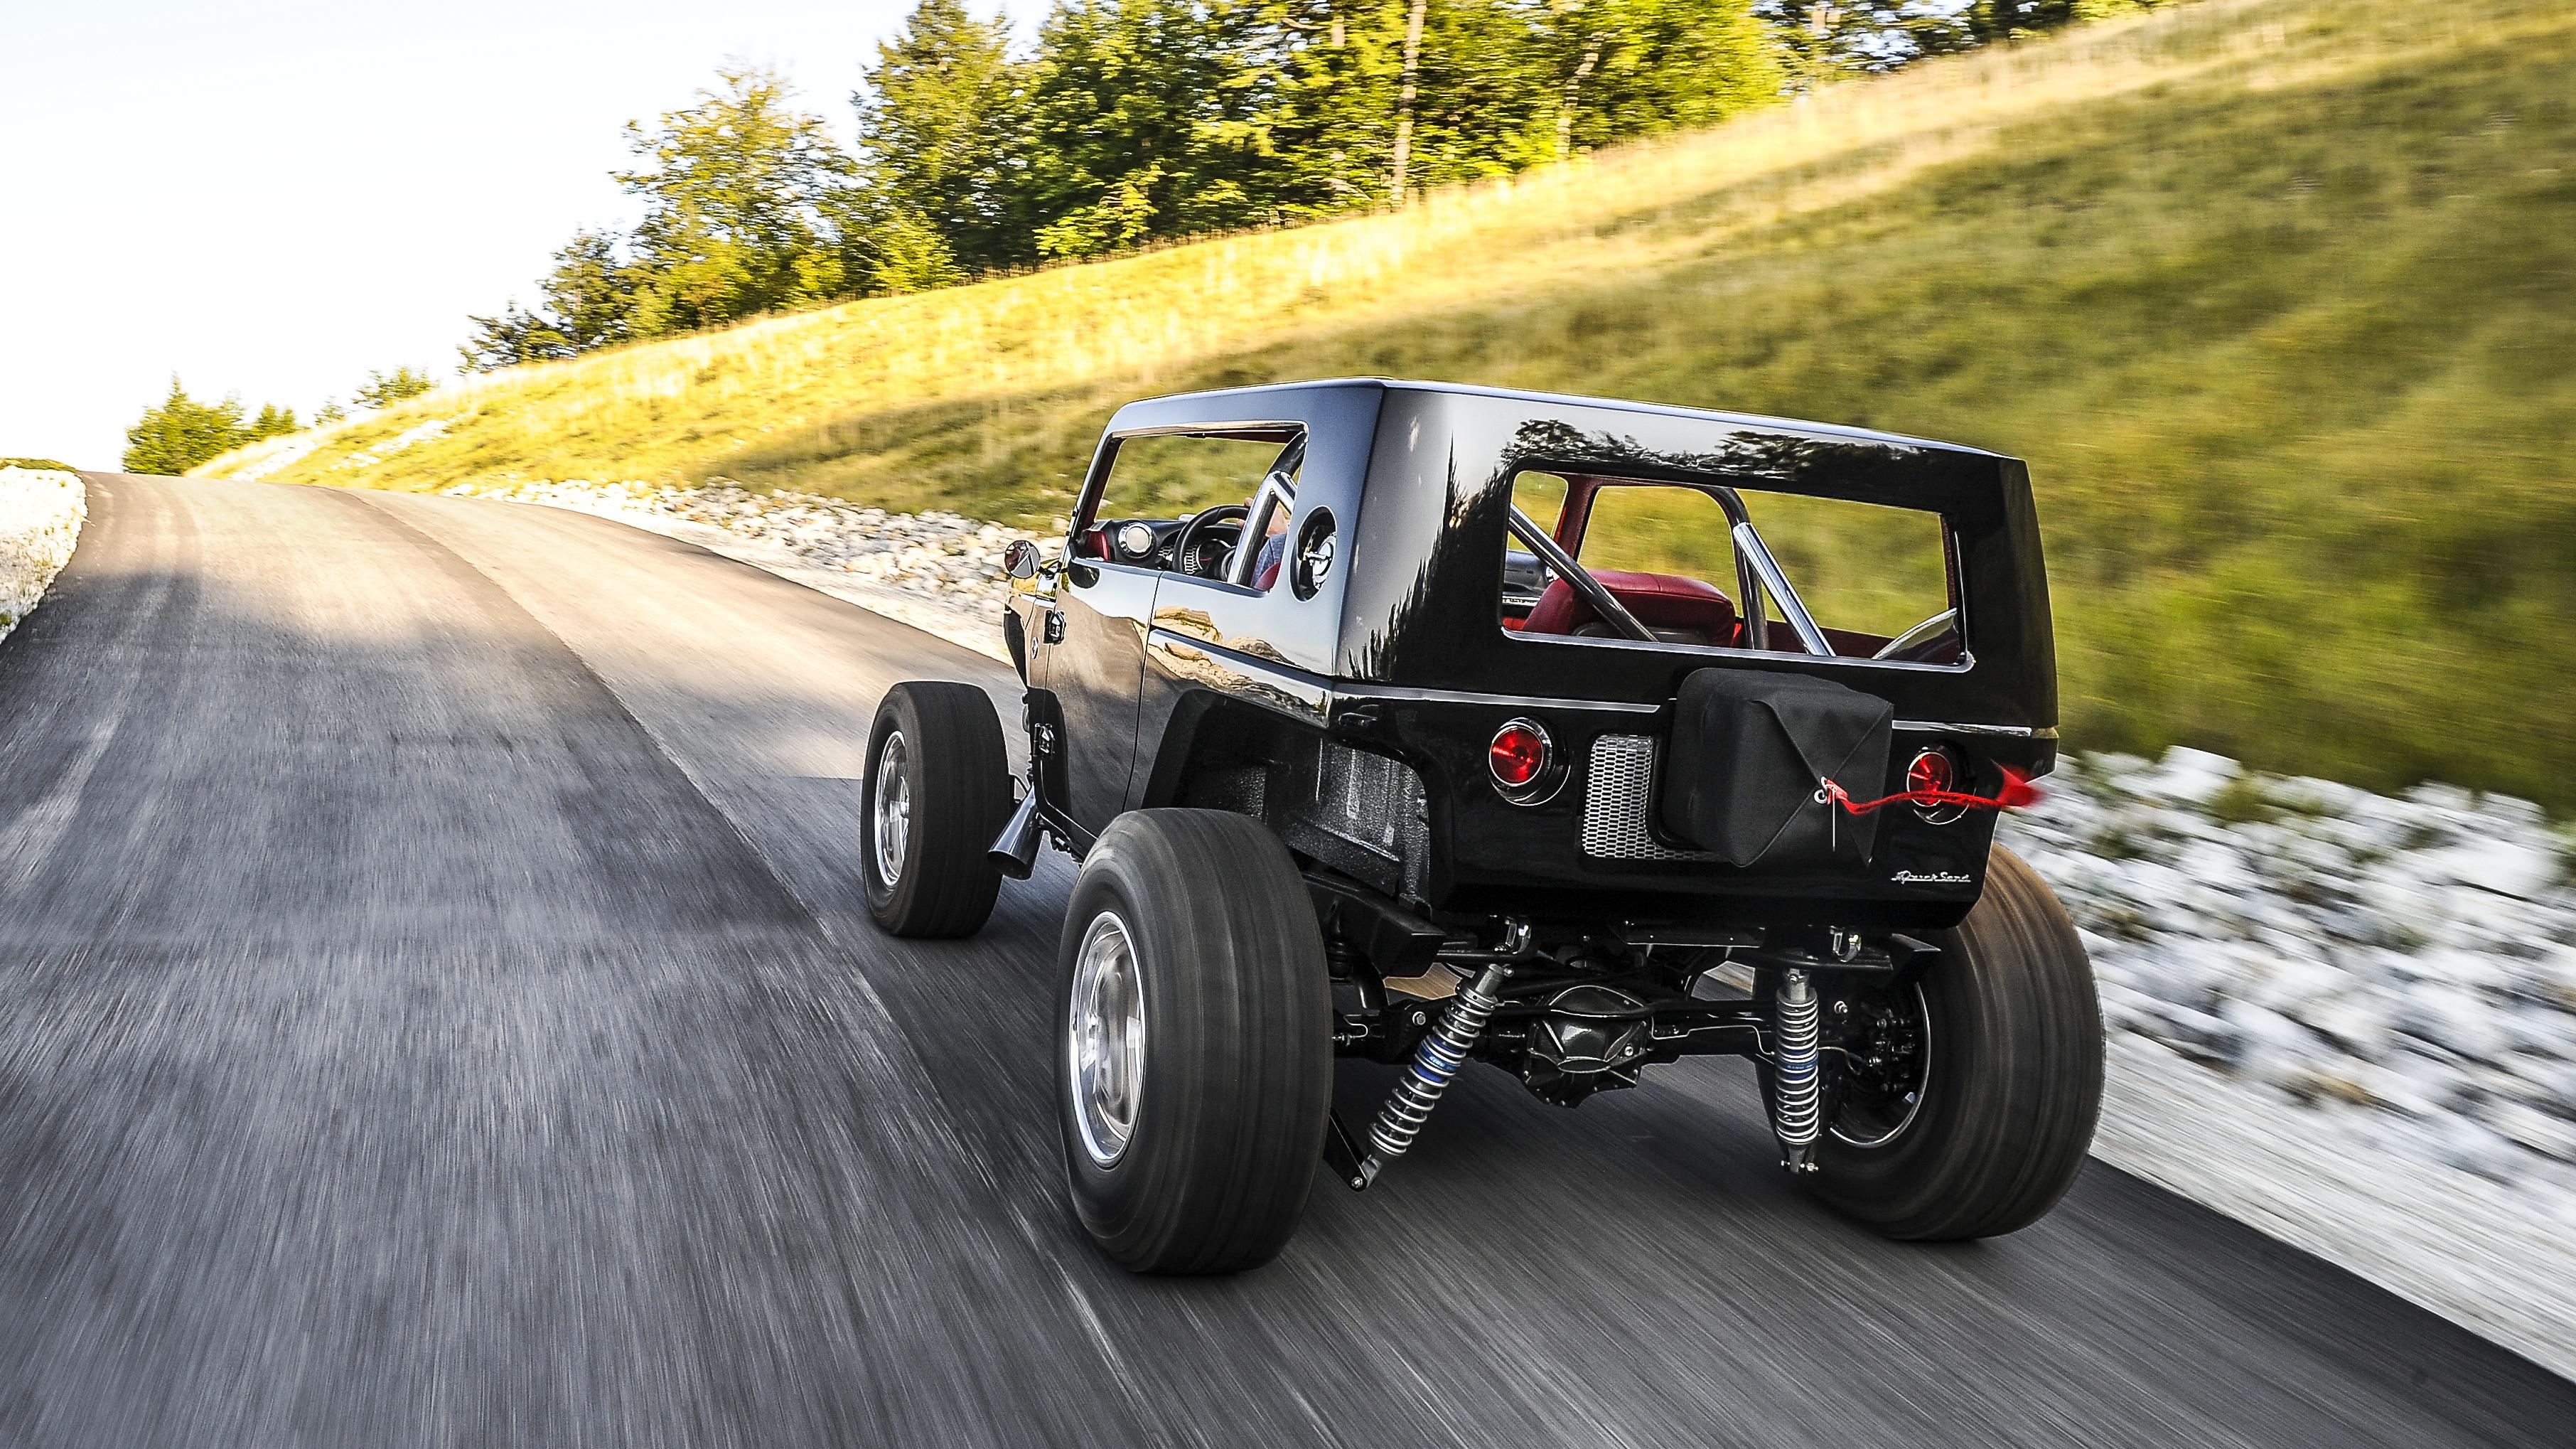 Jeep Quicksand Concept rear quarter